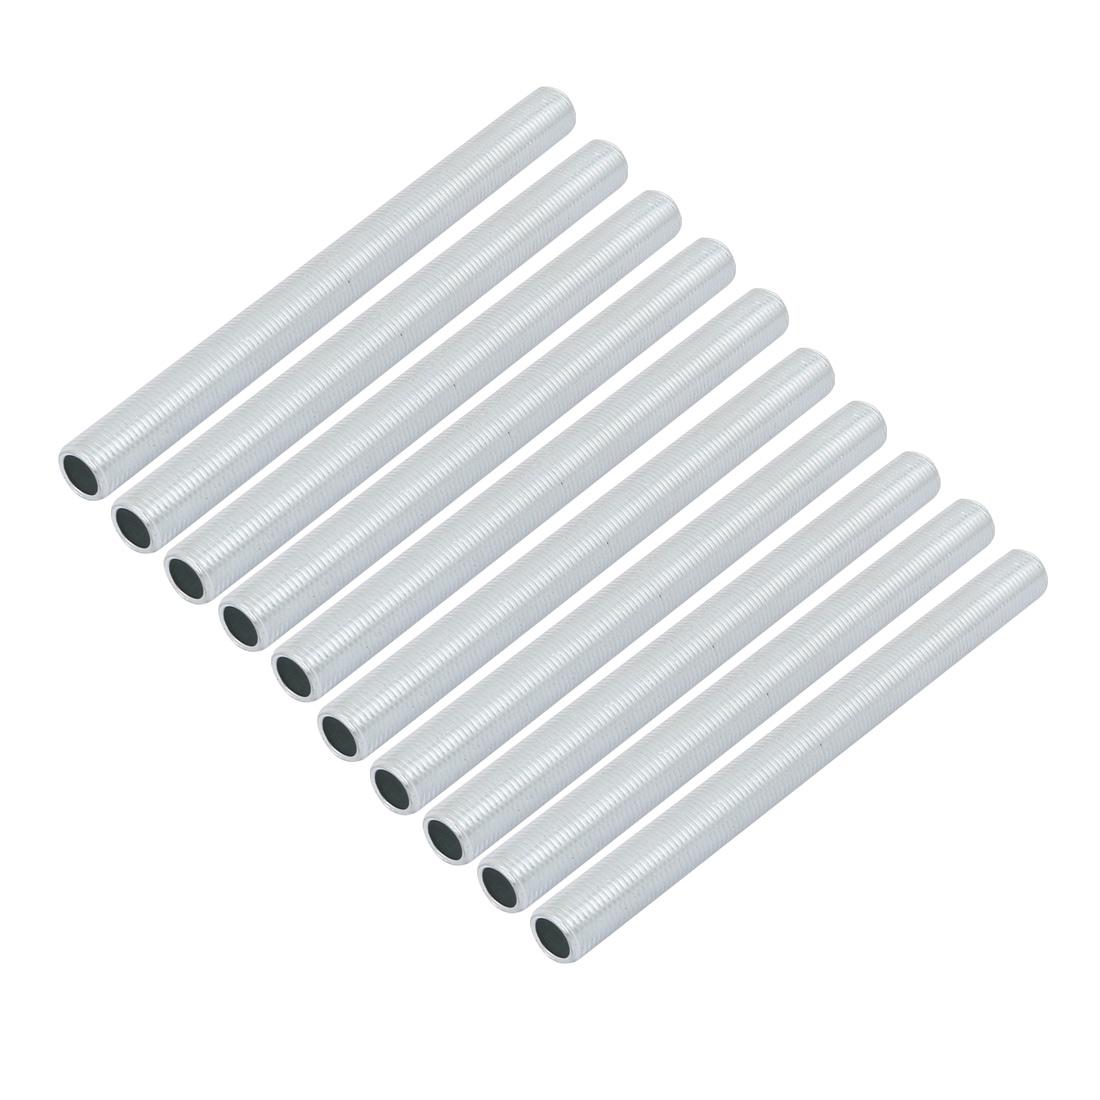 10 Pcs Metric M10 1mm Pitch Thread Zinc Plated Pipe Nipple Lamp Parts 120mm Long